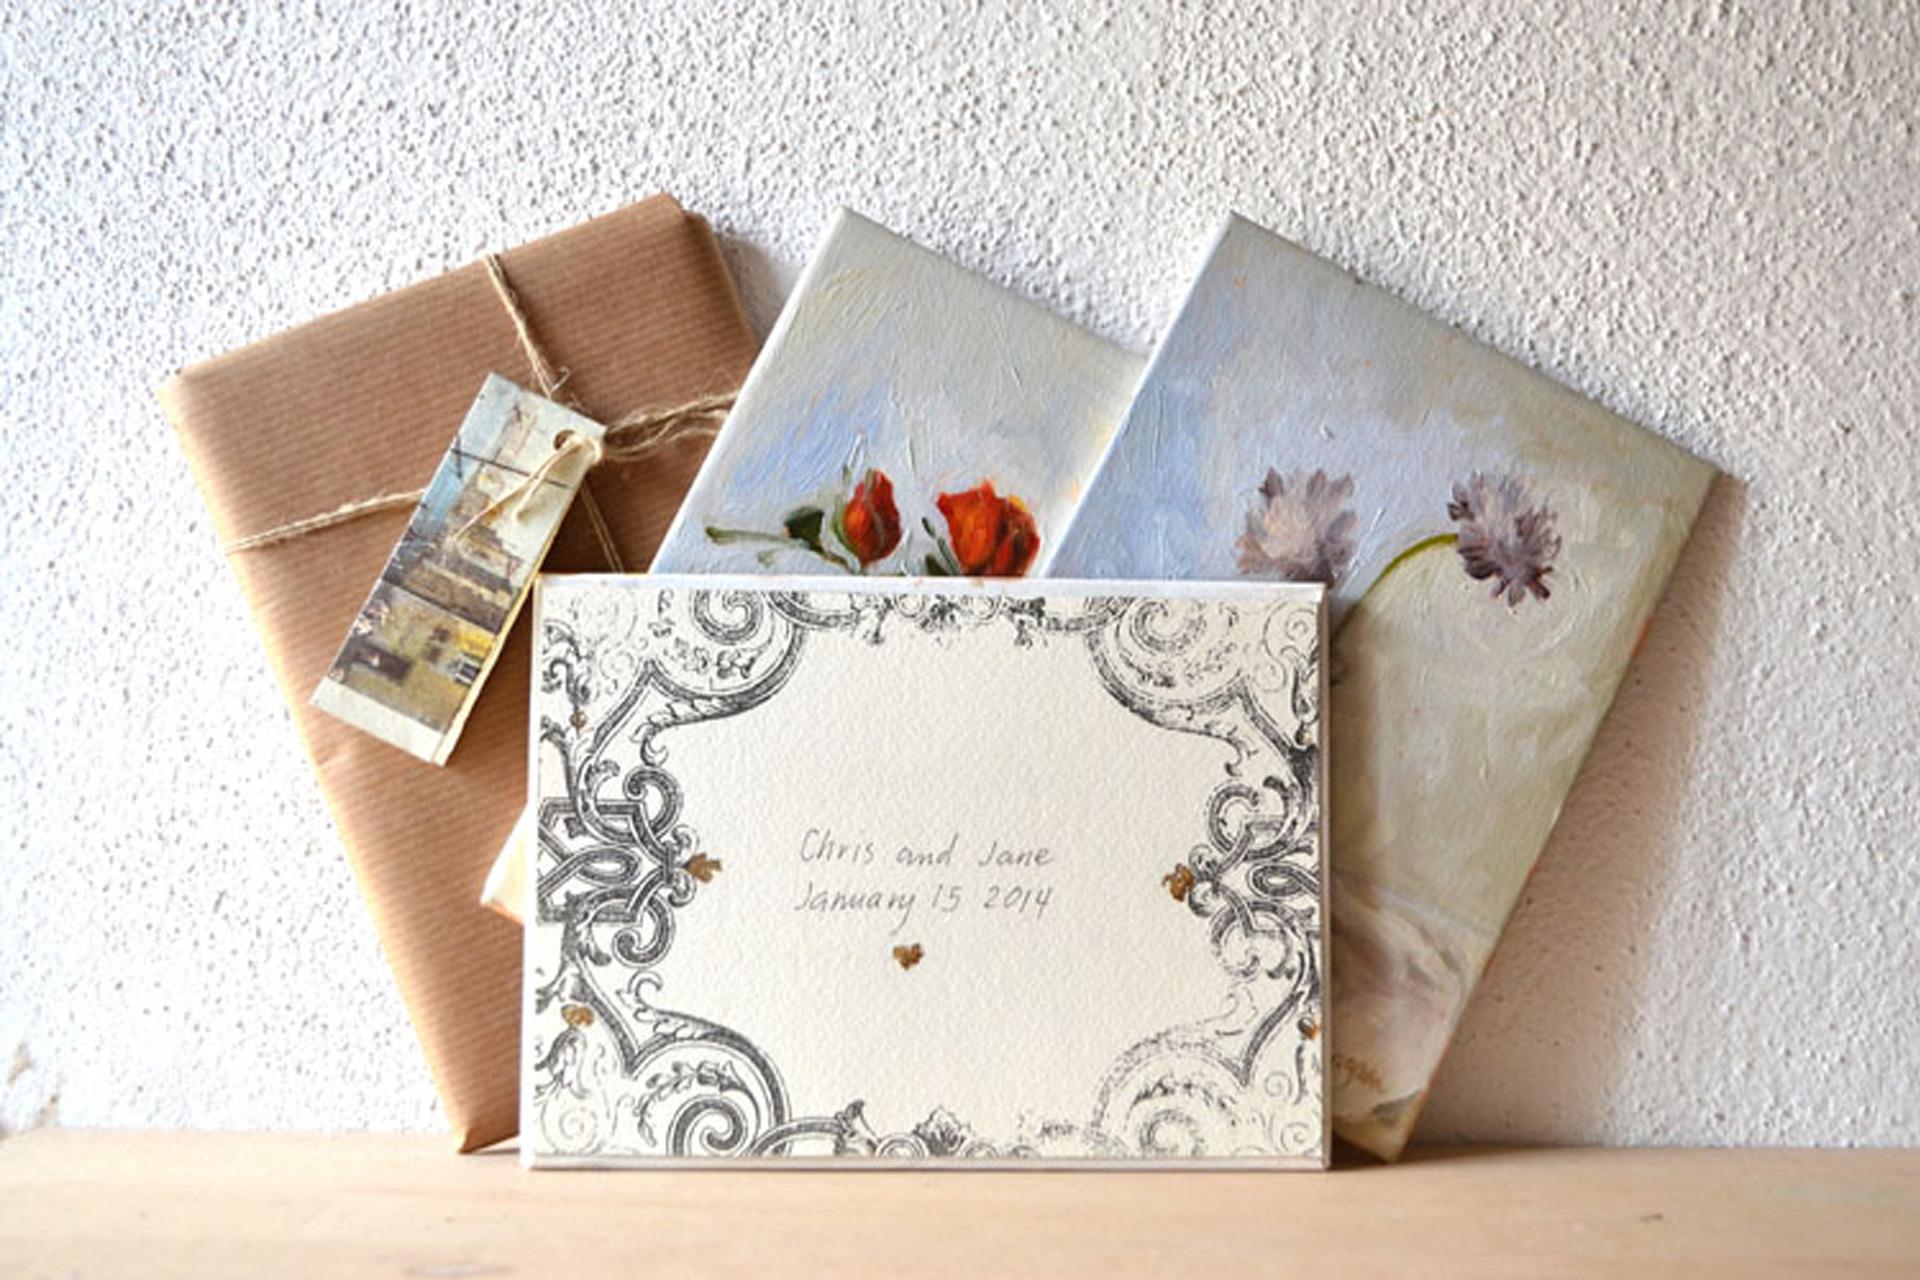 Slider-Home-Caridad-Battagan-personalized-giftwrap